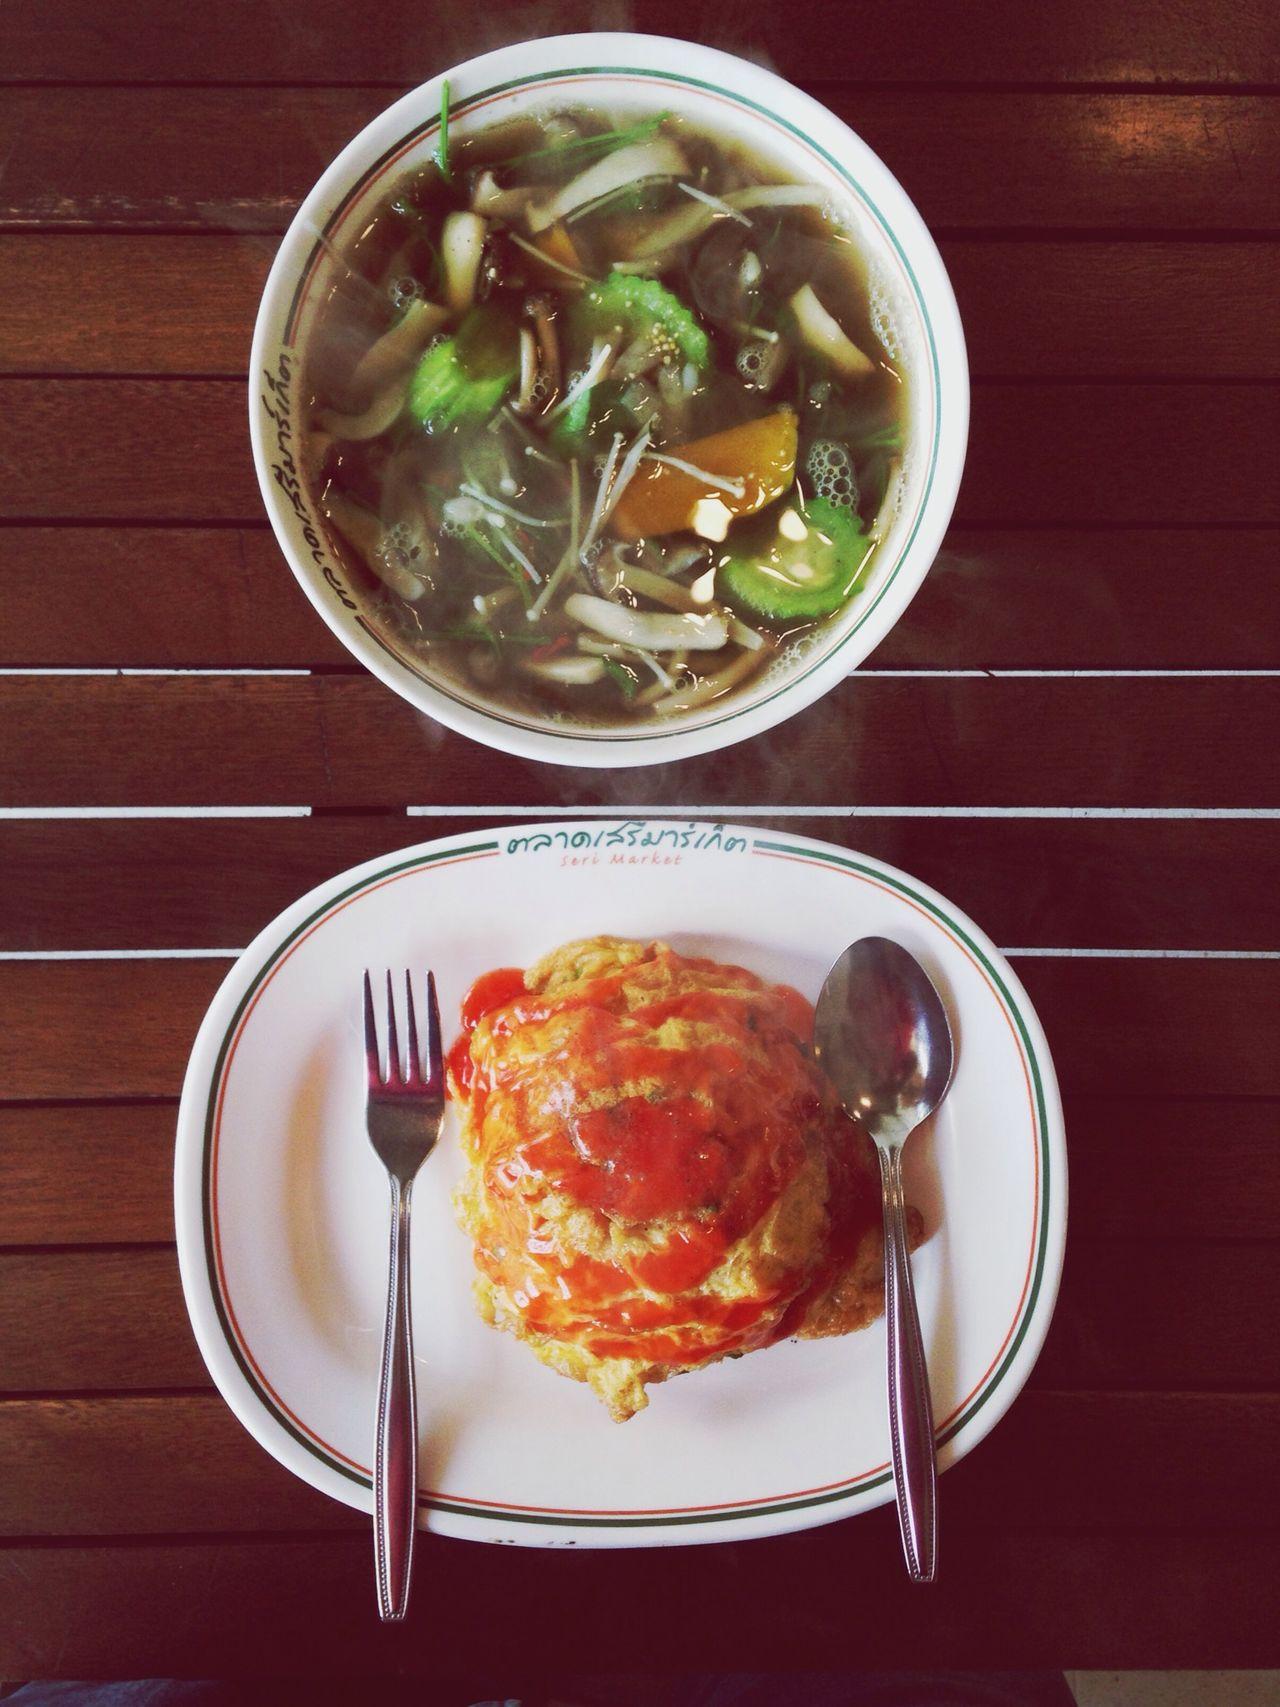 Dinner Veggy Soup Omlet Boil Rice Thai Meal Tomato Sauce Plain Rice Nice Meal